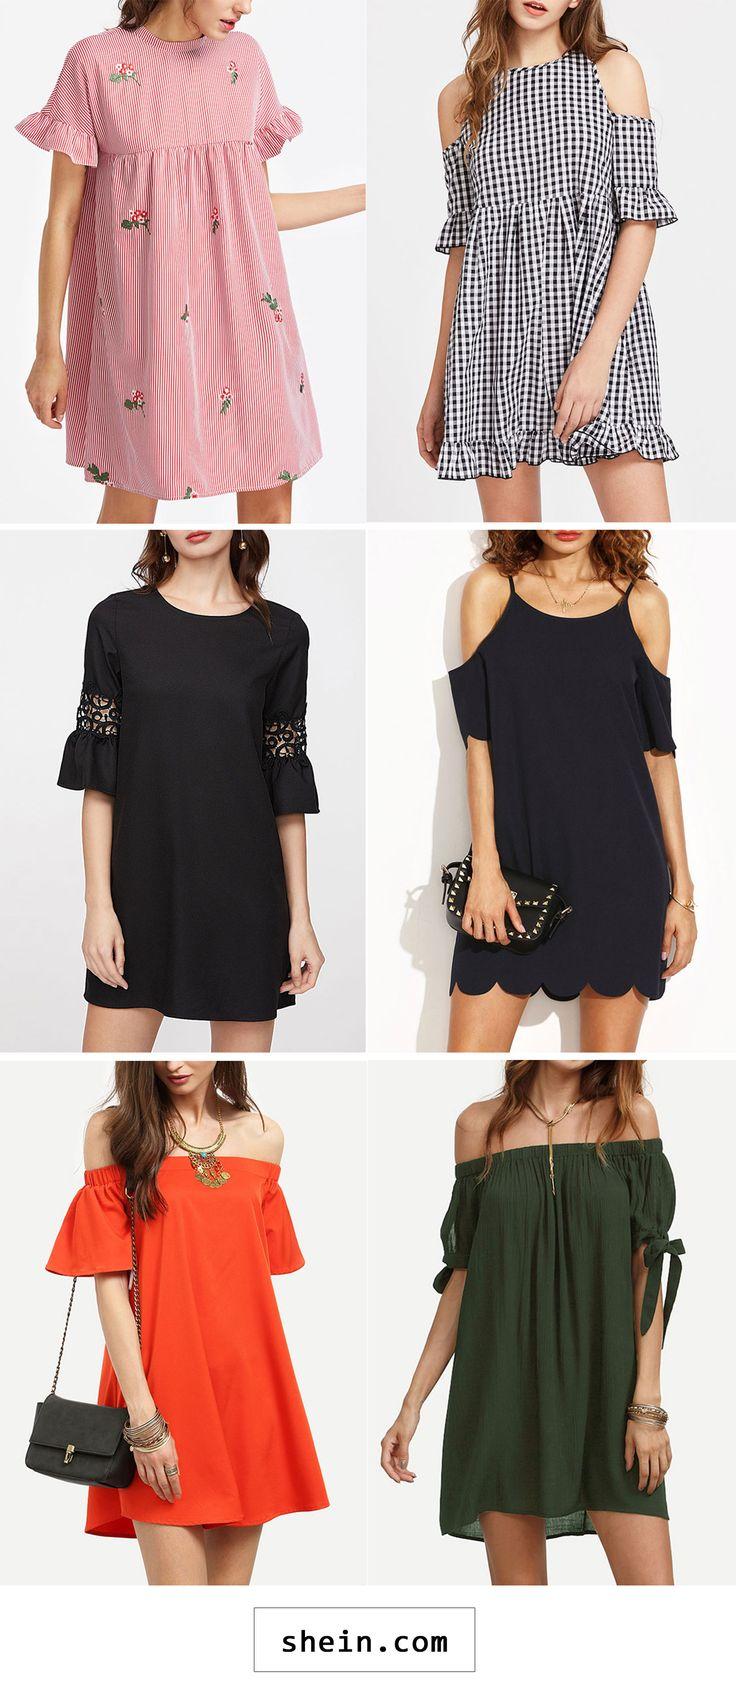 Chic dresses